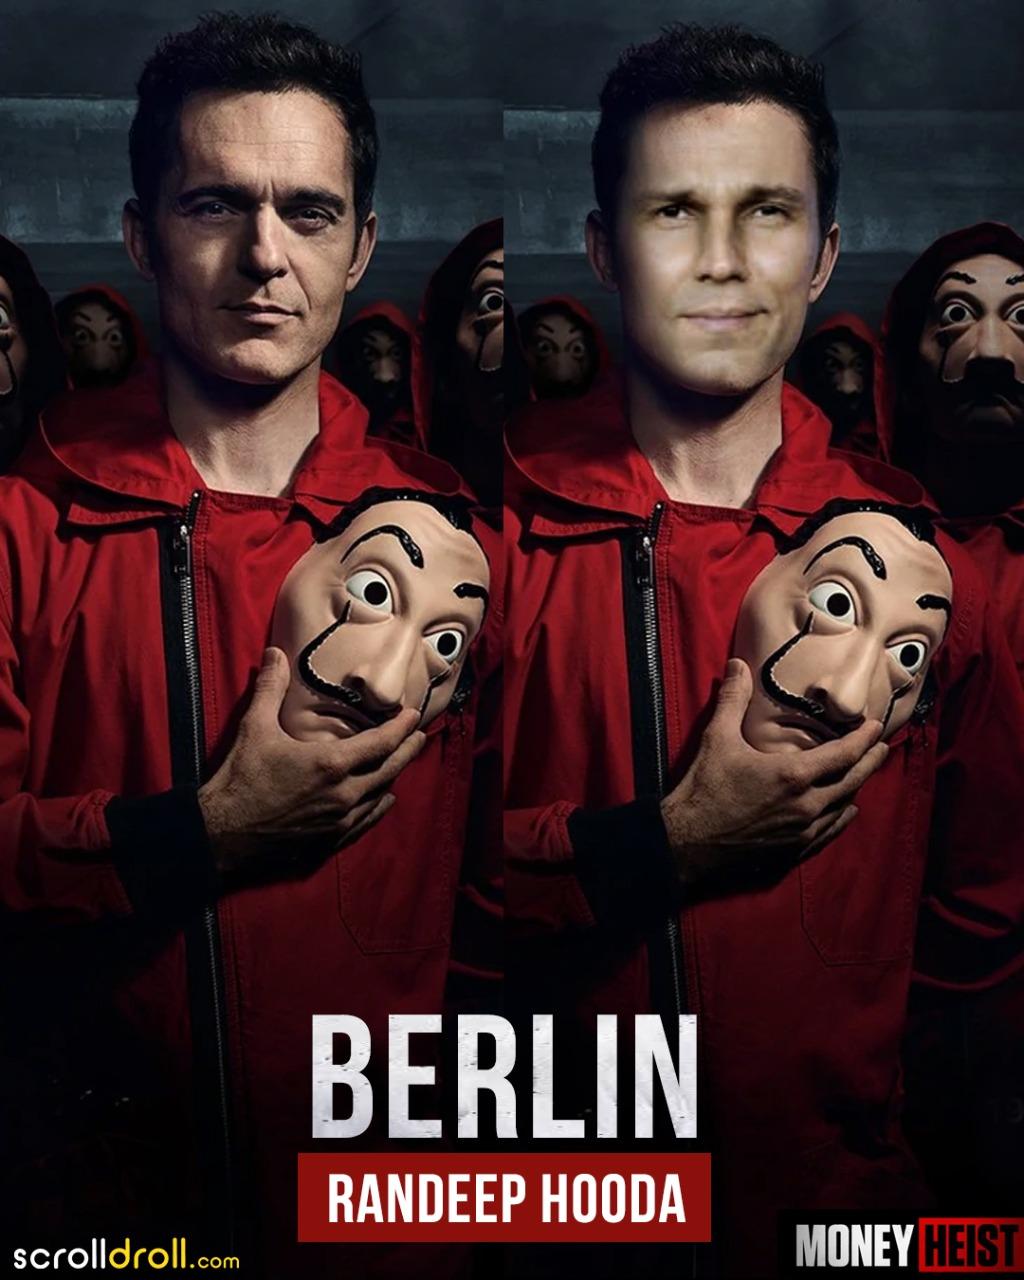 Money-Heist-With-A-Bollywood-Cast-Berlin